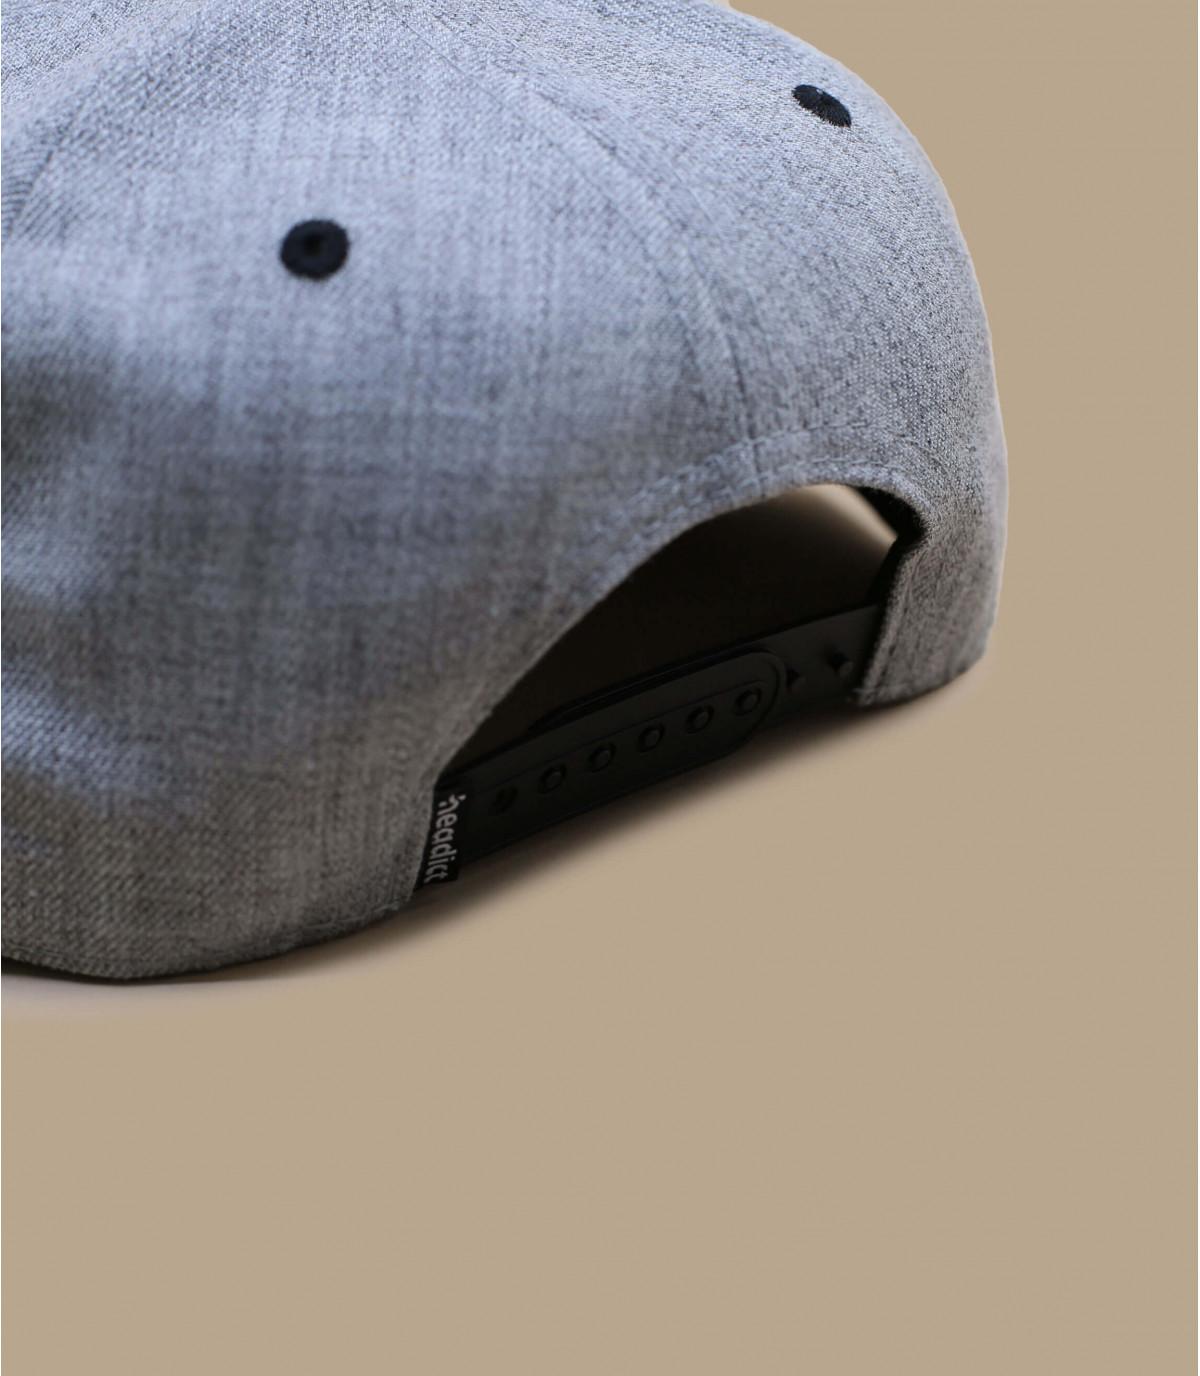 Details Snapback Cloned To Kill grey black - Abbildung 4